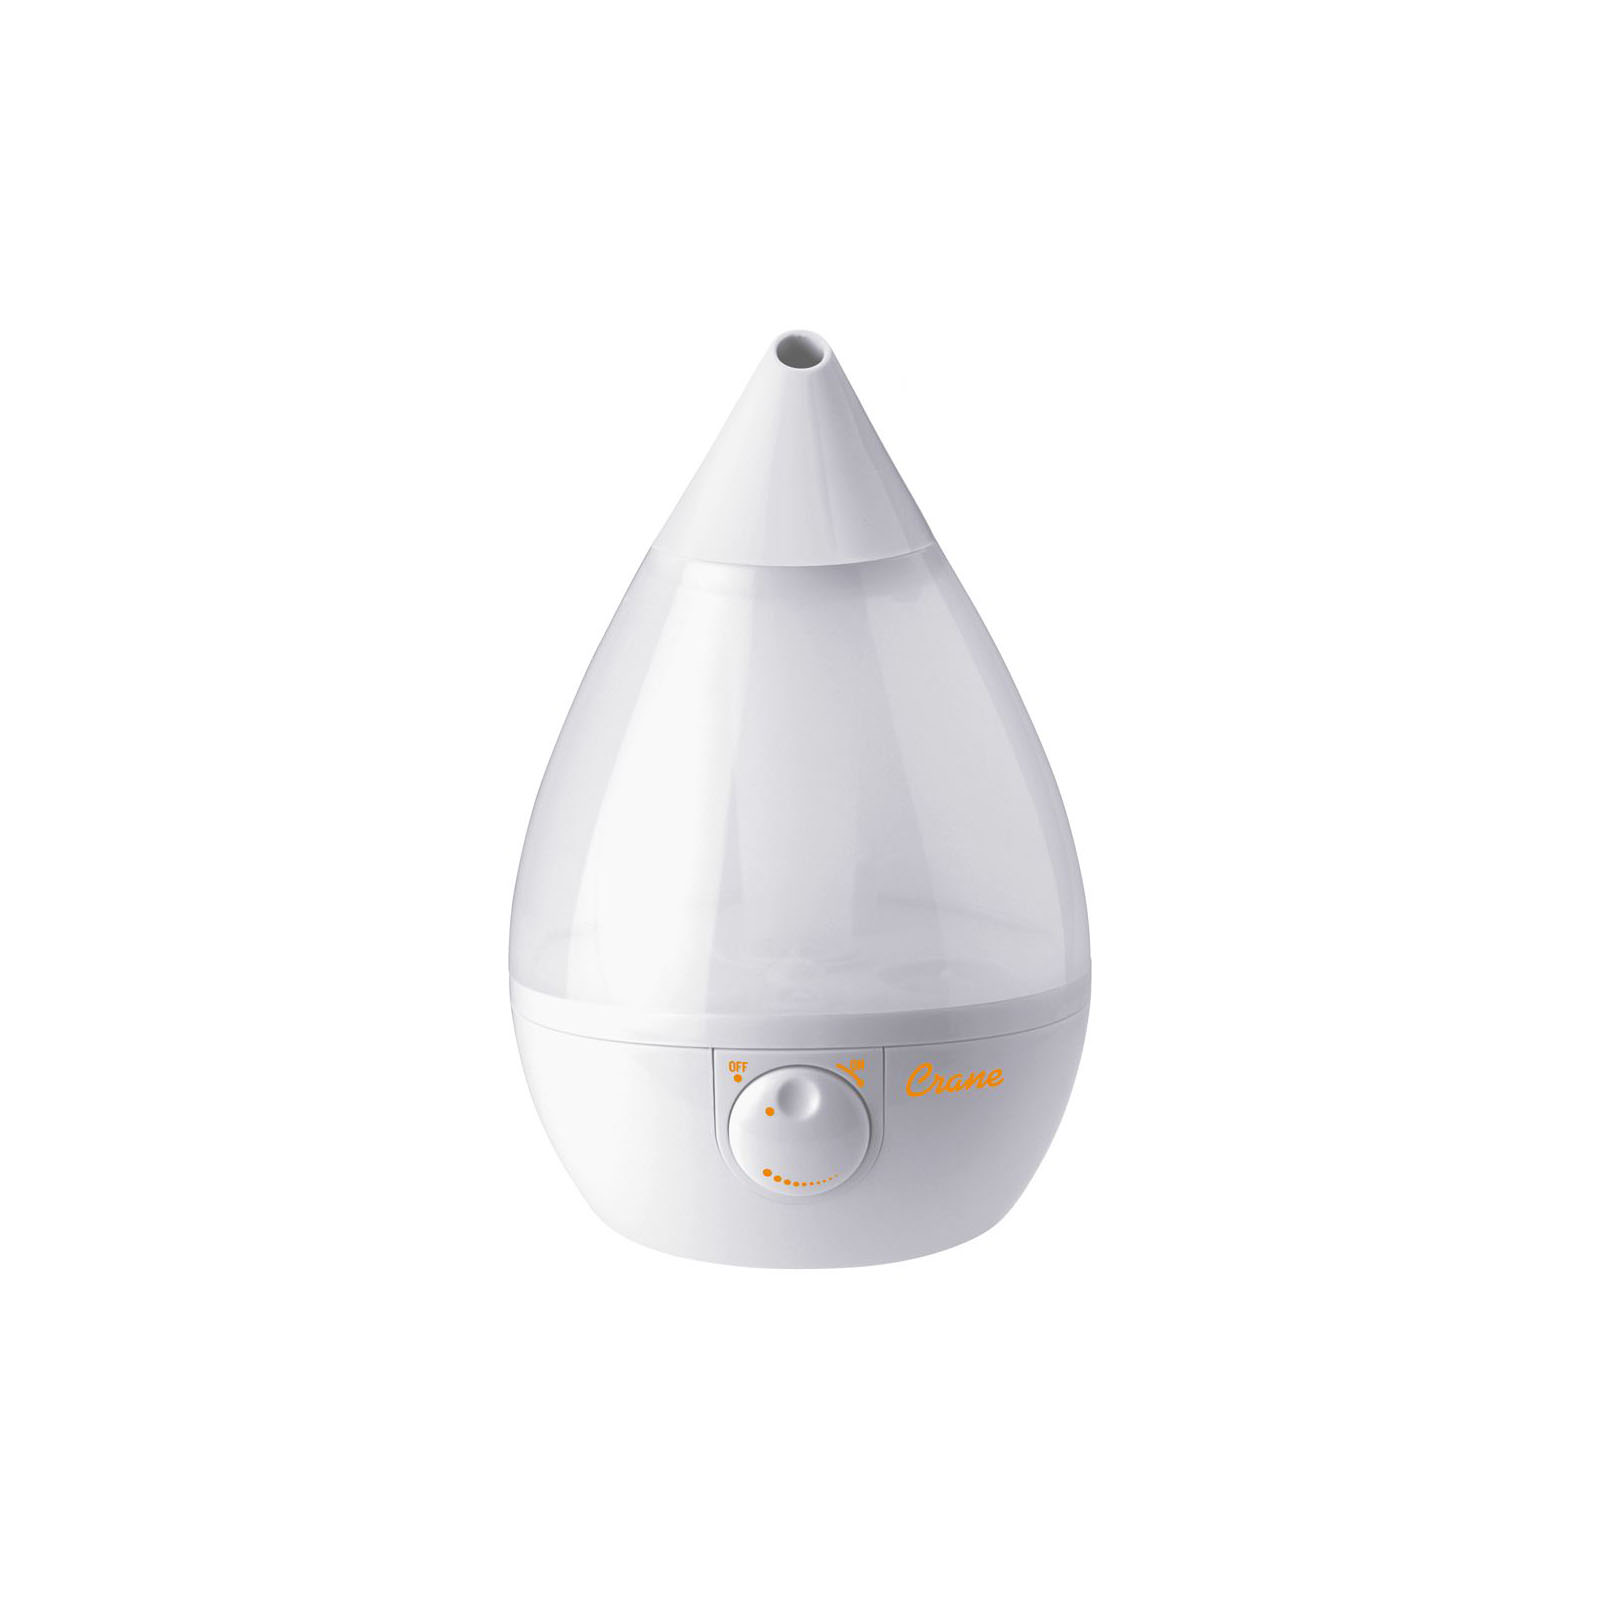 Crane USA EE-5301W Cool Mist Drop-Shape Humidifier - White PartNumber: 03211205000P KsnValue: 03211205000 MfgPartNumber: EE-5301W